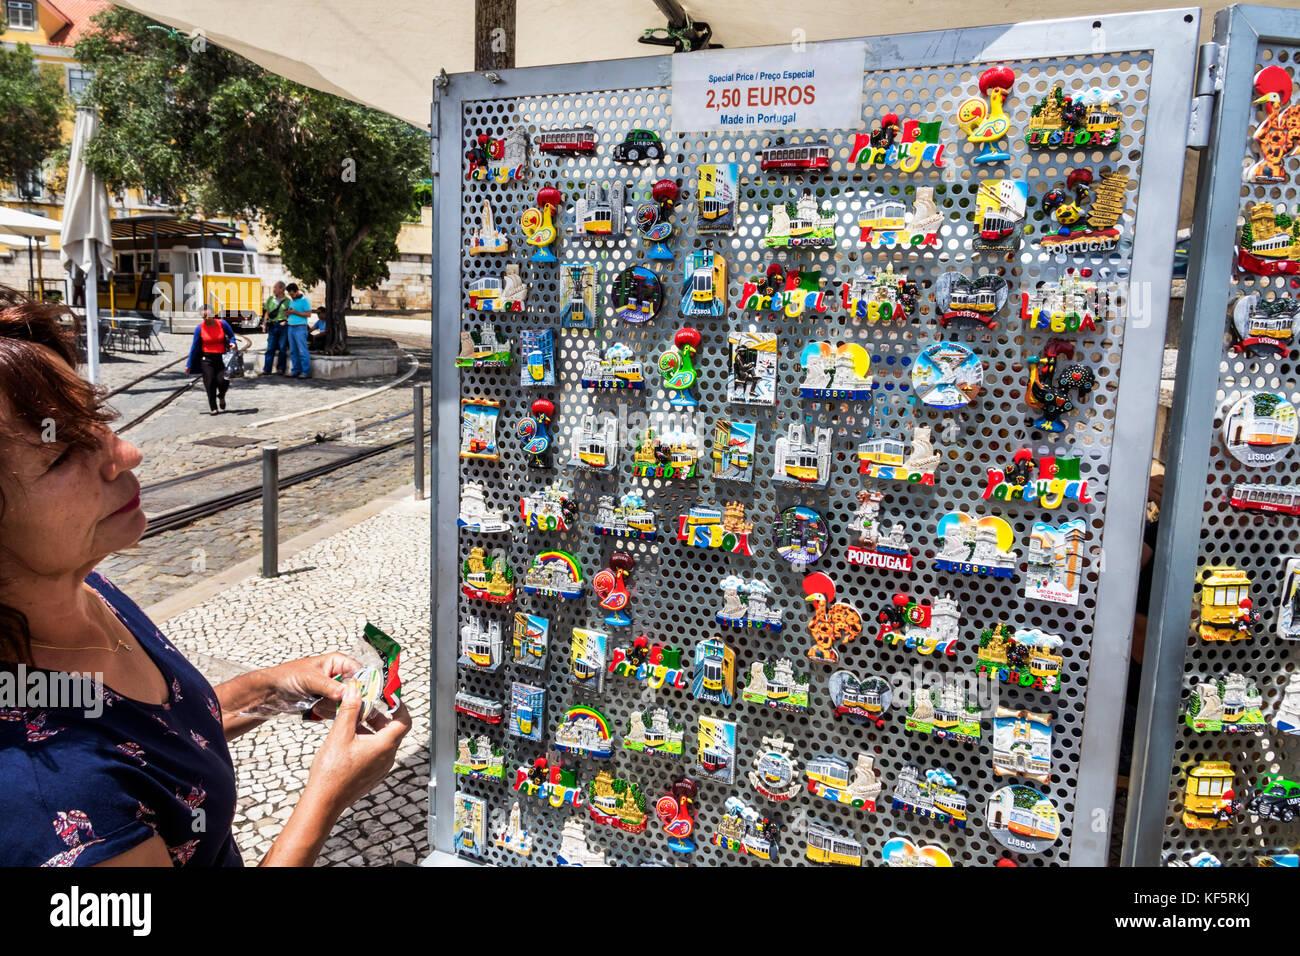 Lisbon Portugal Belem historic district Rua de Belem street vendor souvenirs refrigerator magnets woman shopping - Stock Image